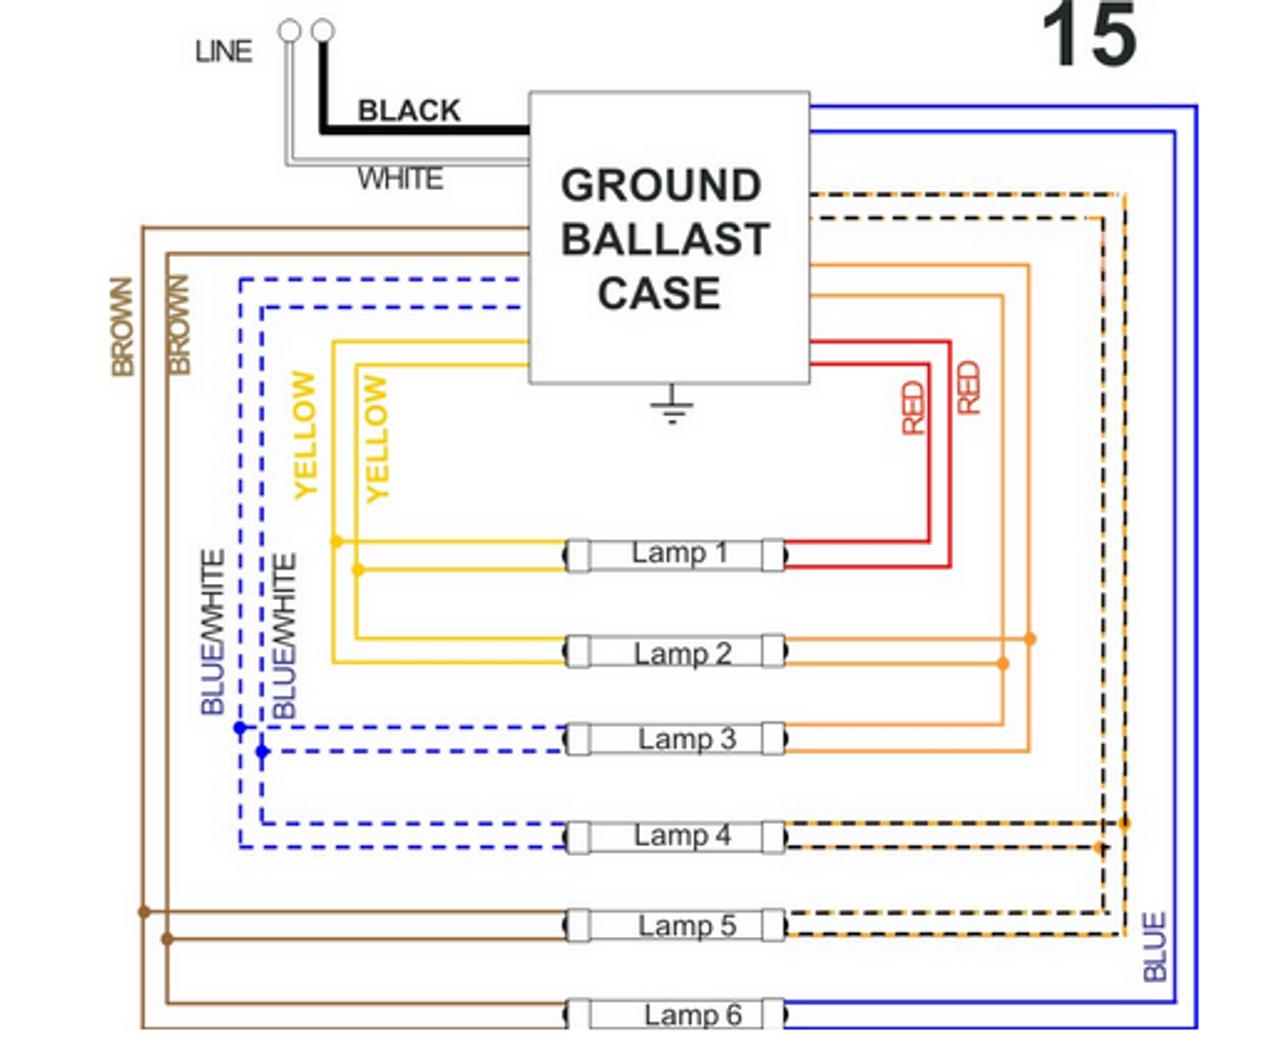 allanson 672-at magnetic sign ballast allanson ballast wiring diagram